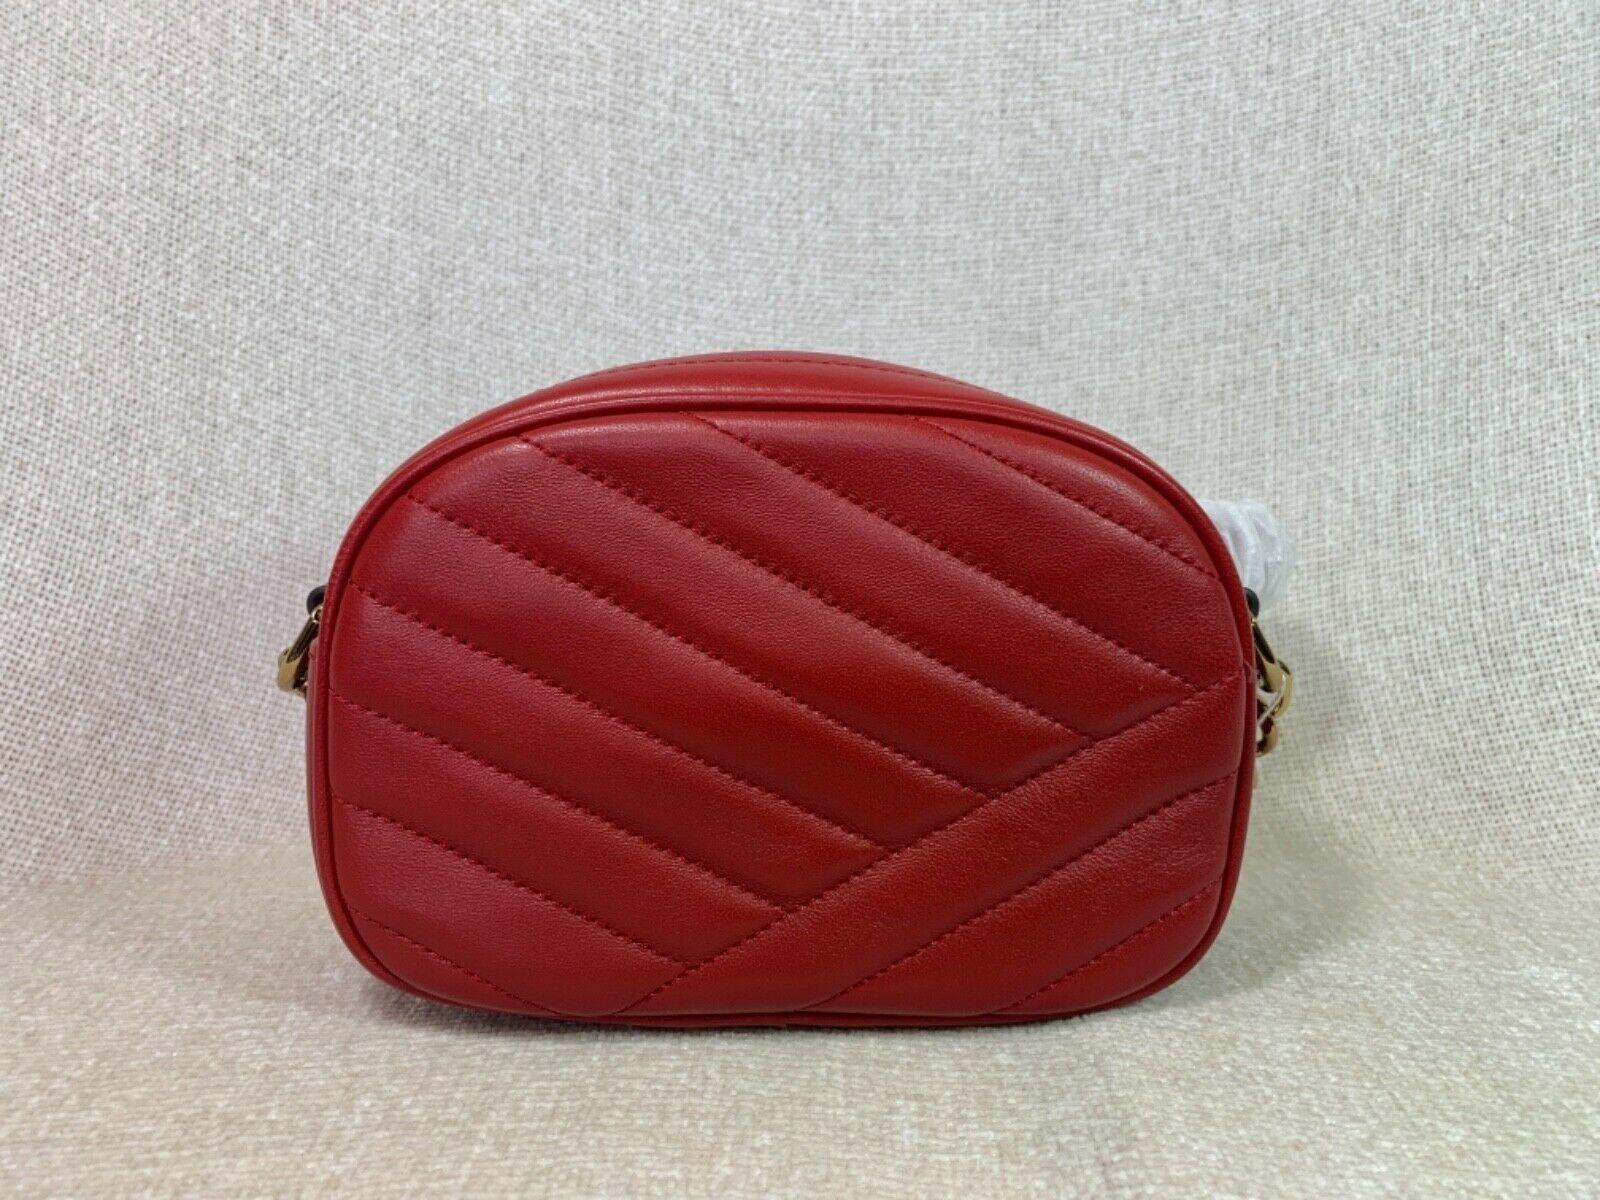 NWT Tory Burch Red Apple Kira Chevron Small Camera Bag $358 image 6